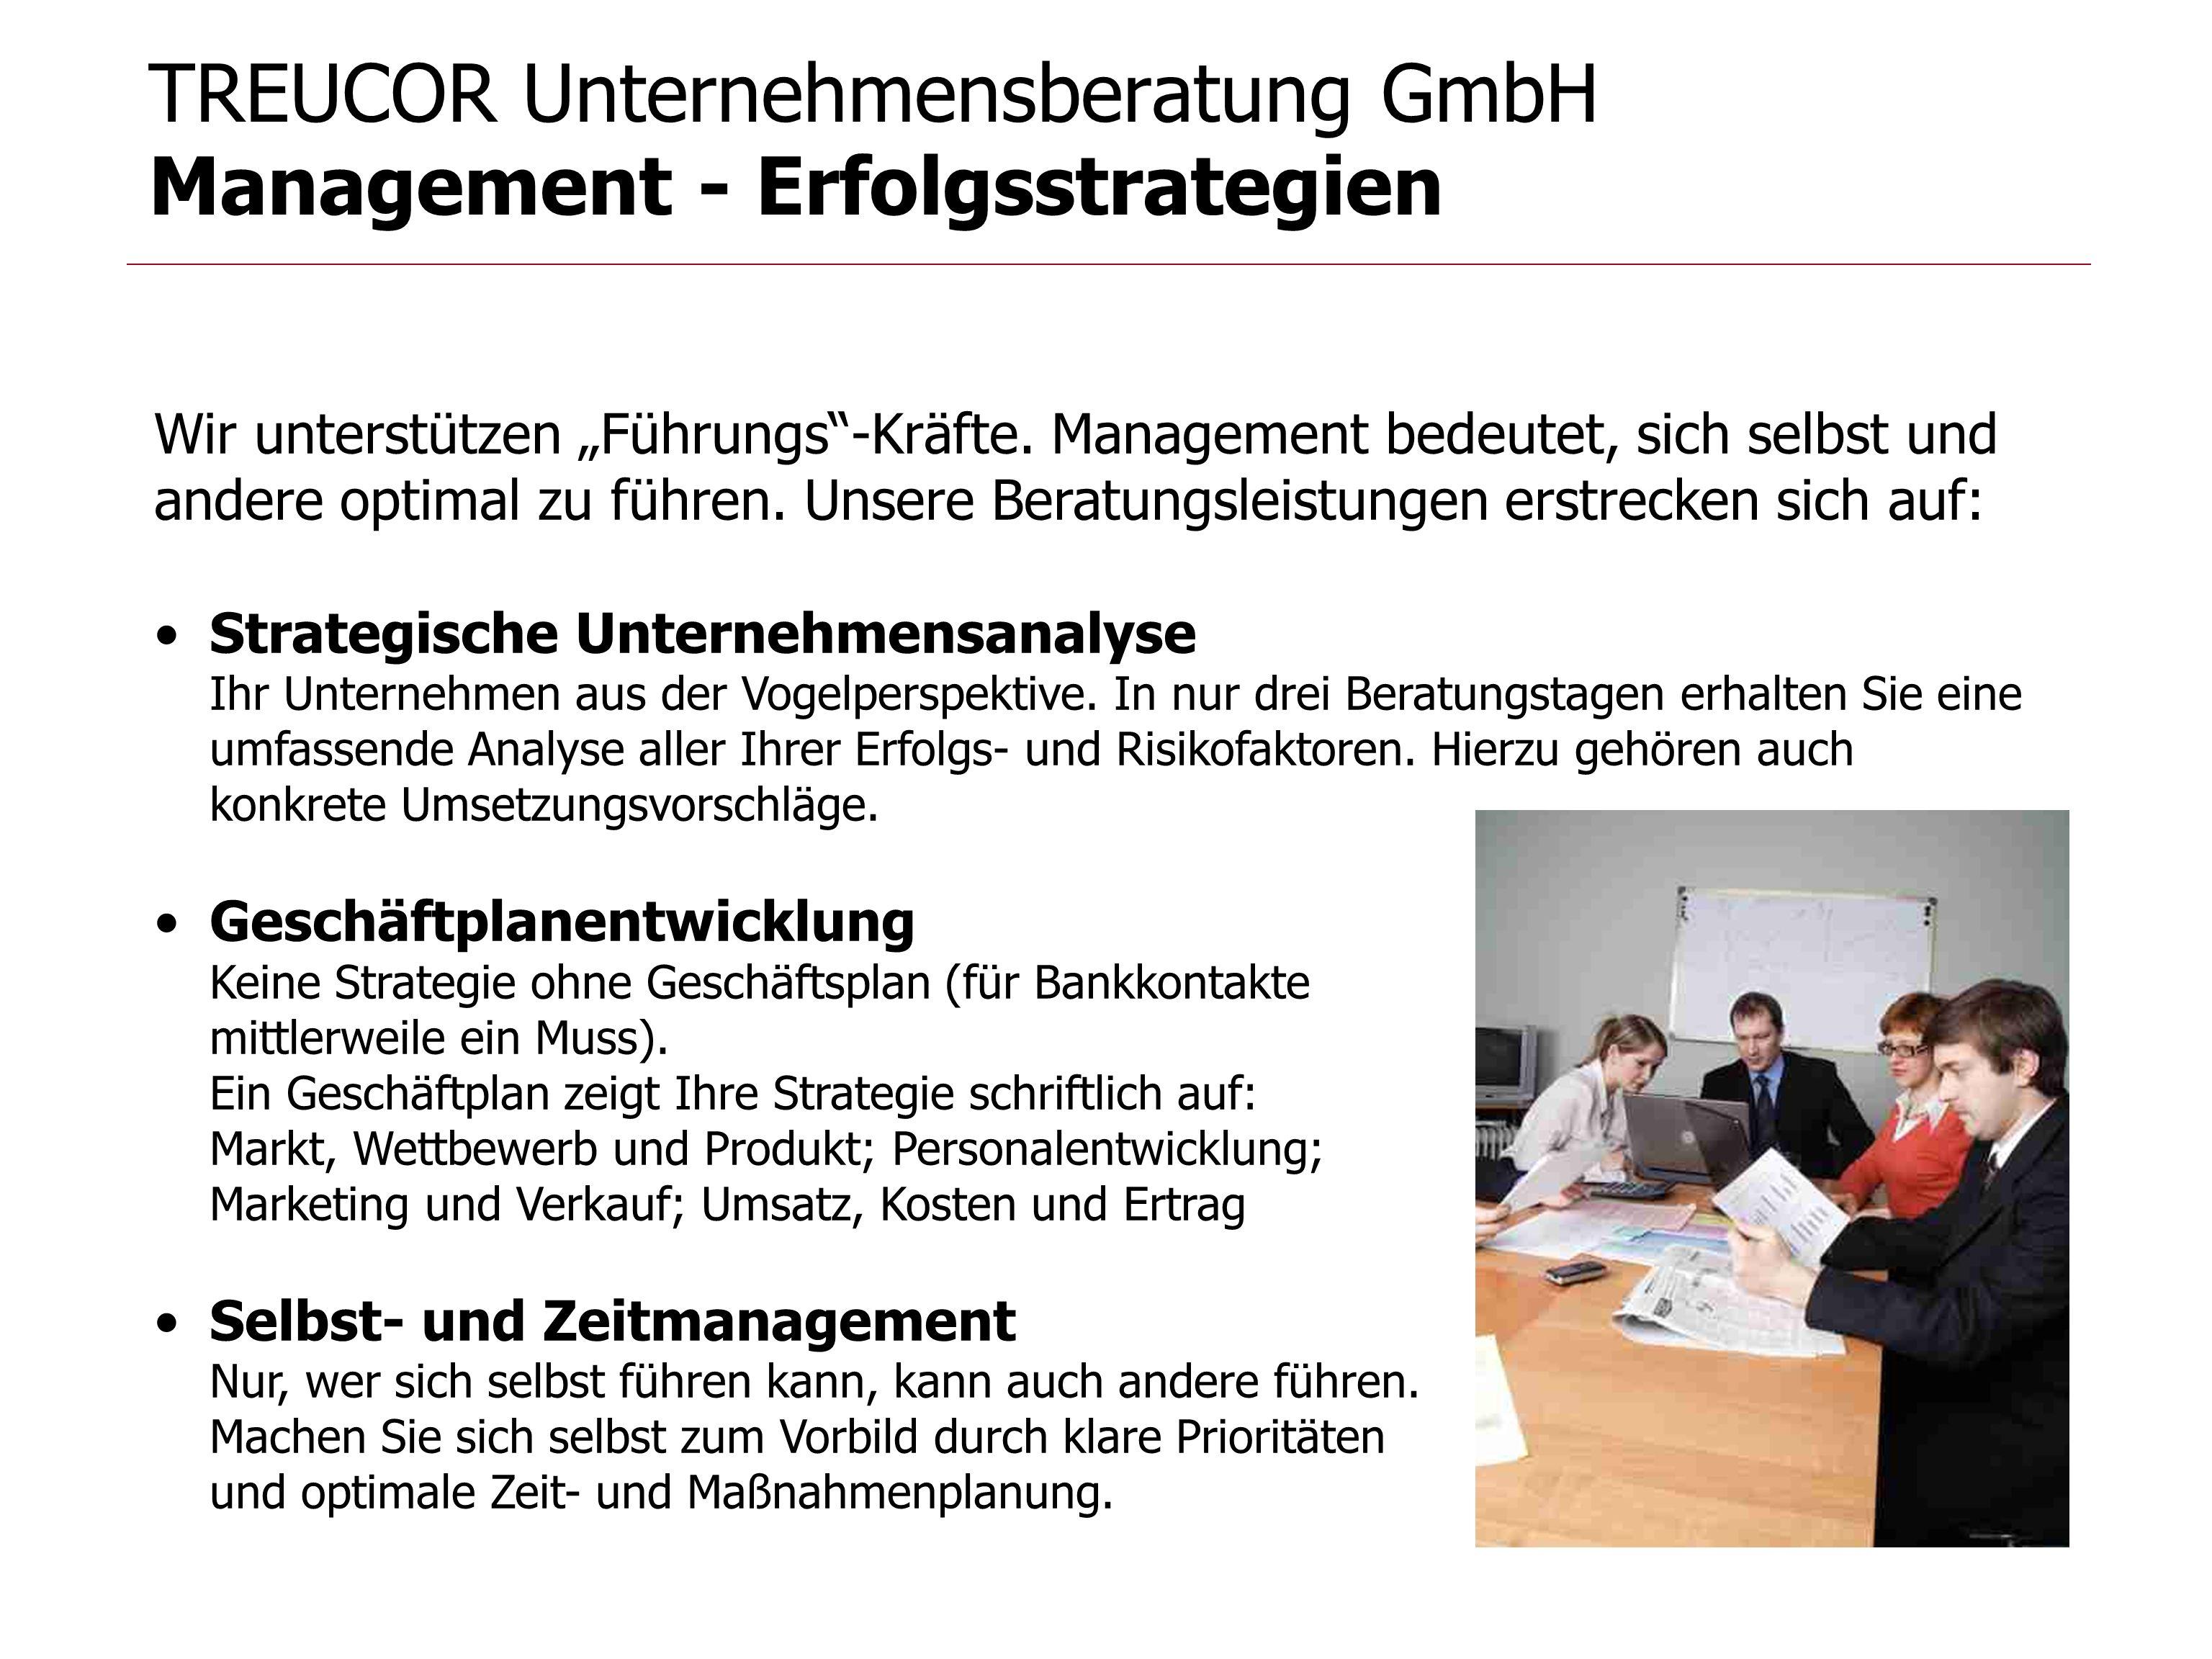 TREUCOR Unternehmensberatung GmbH Kommunikation - Personal Erfolgsfaktor Nr.